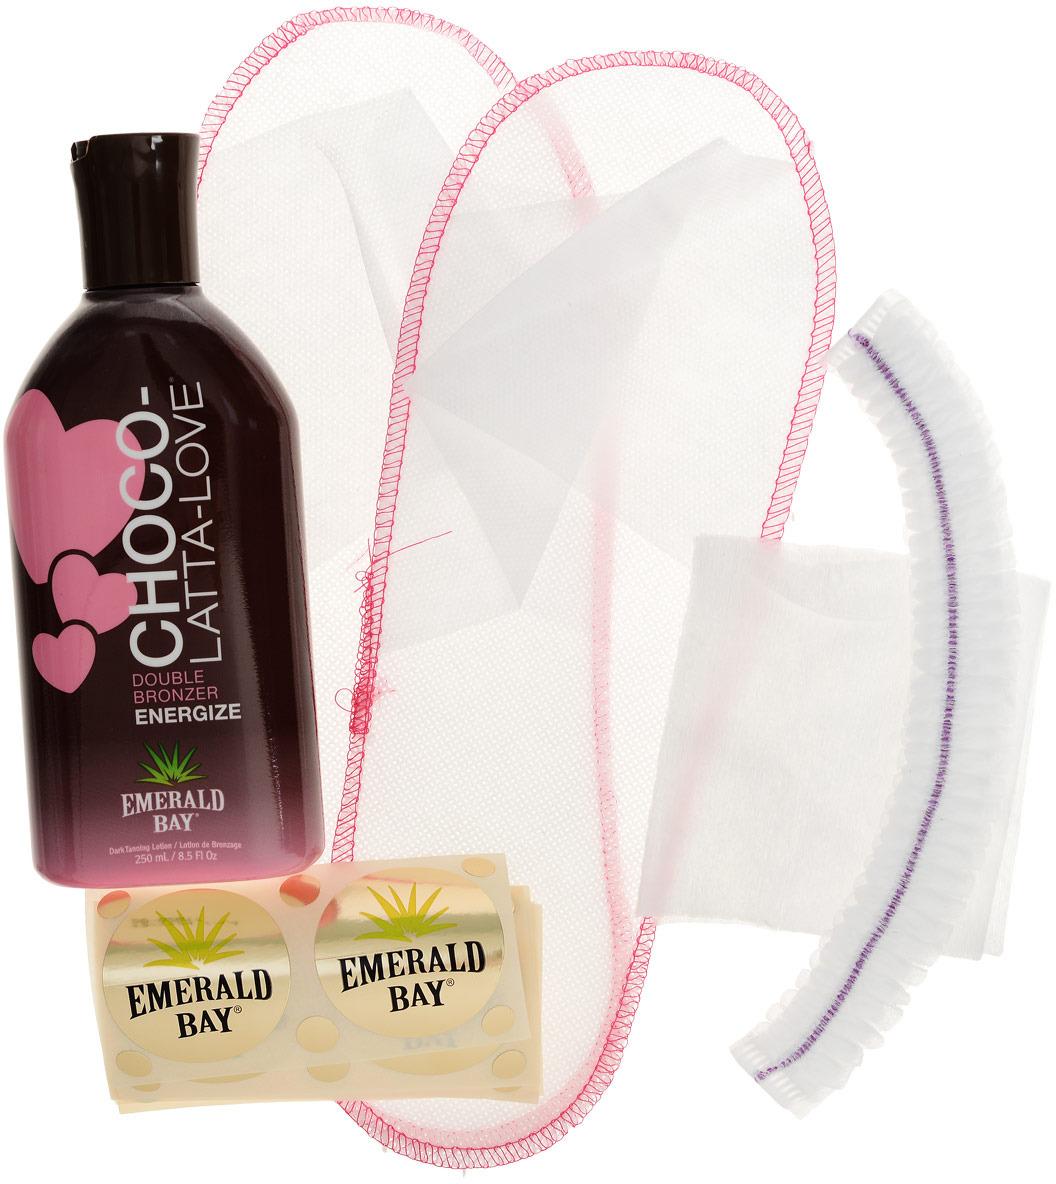 Комплект для солярия Emerald Bay Choco-Latta-Love, 250 мл крем для загара в солярии emerald bay choco latta love 15 мл х 5 шт